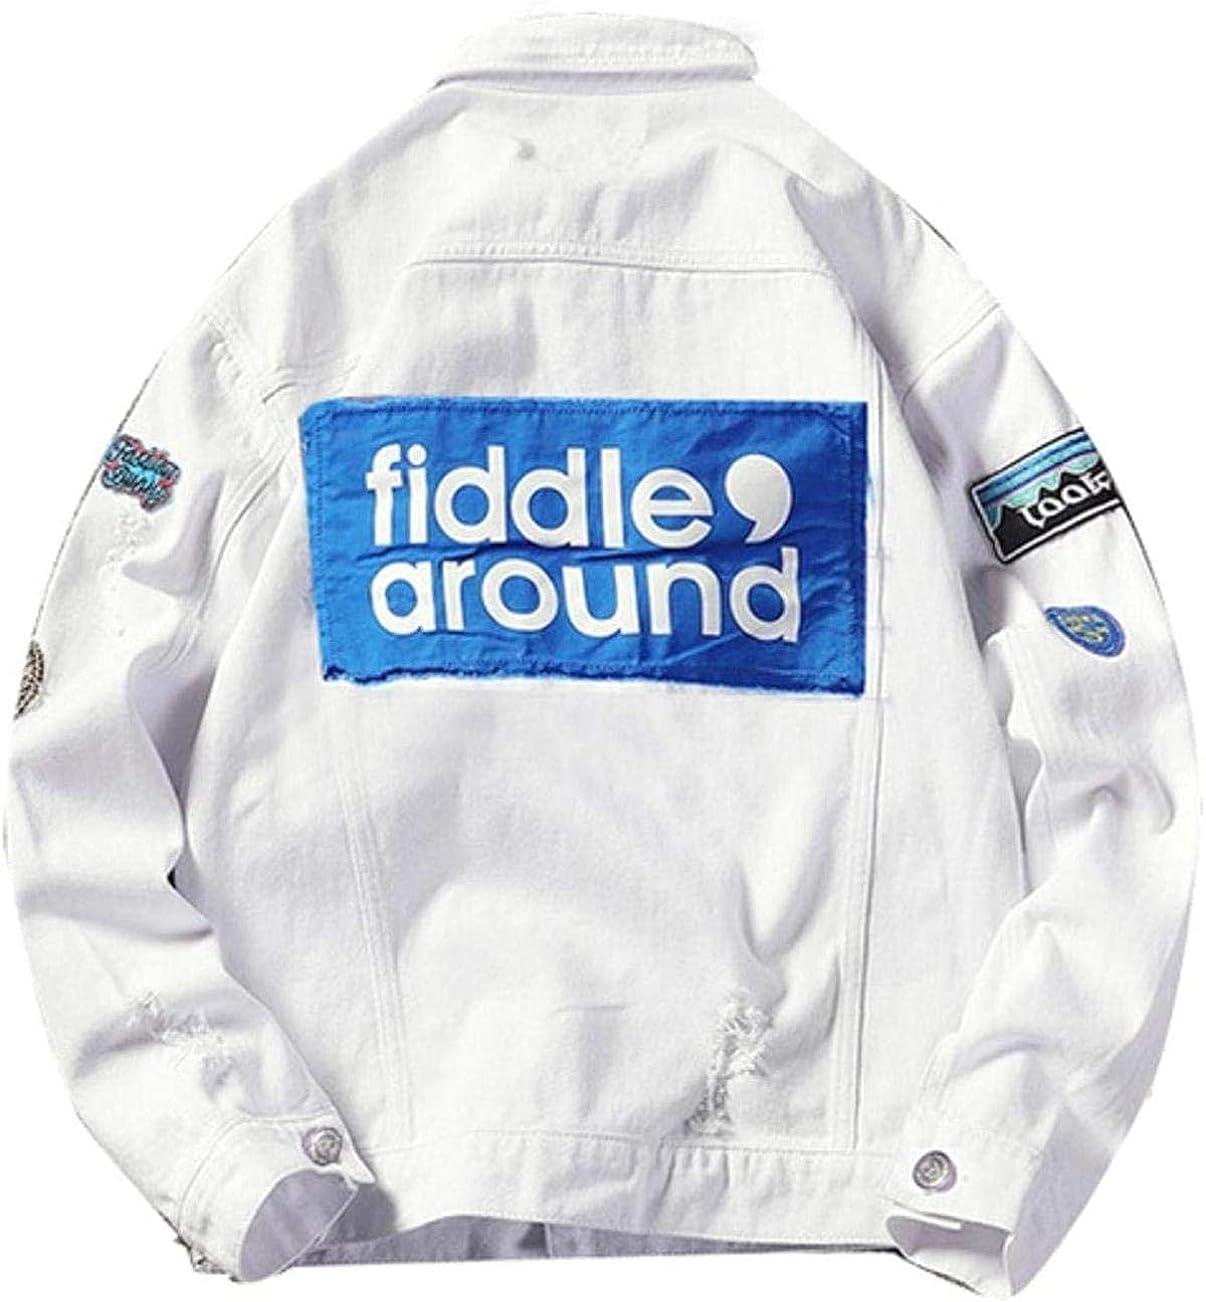 Men's White Ripped Denim Jacket Patchwork Streetwear Oversized Jeans Jacket